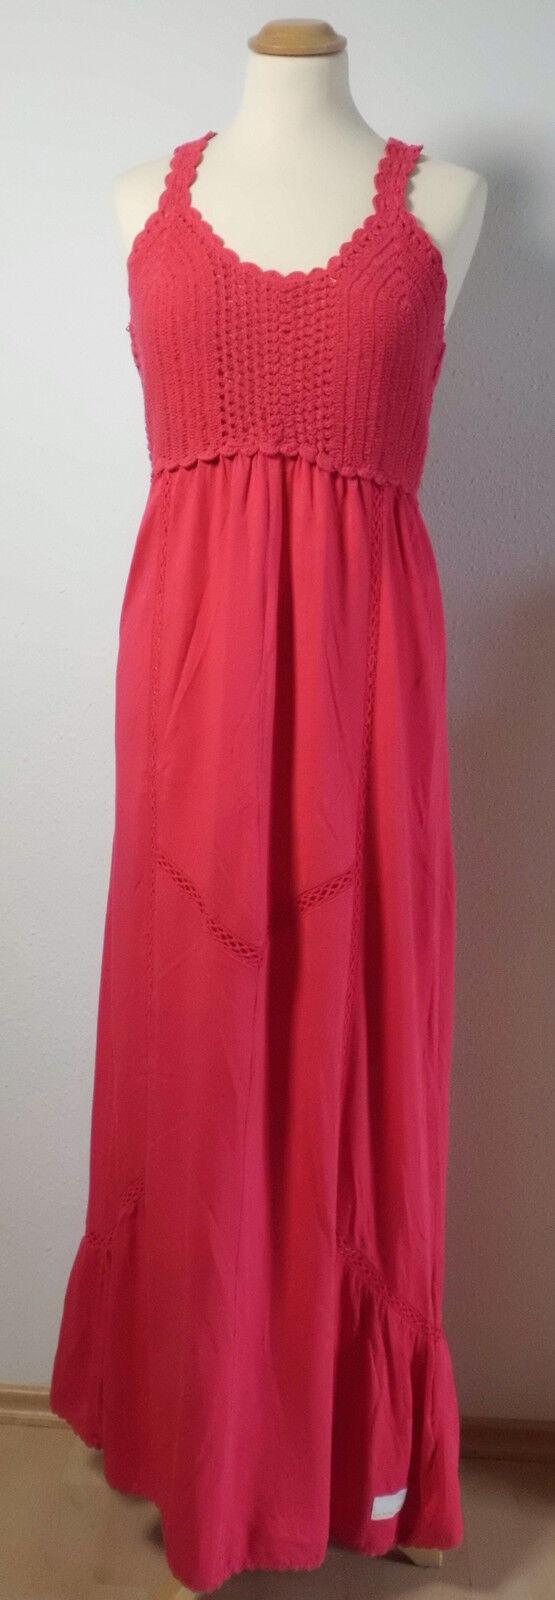 ODD MOLLY exklusives Damen Kleid Rosa Gr. 0 ( 32   34 ) NP.  189 -